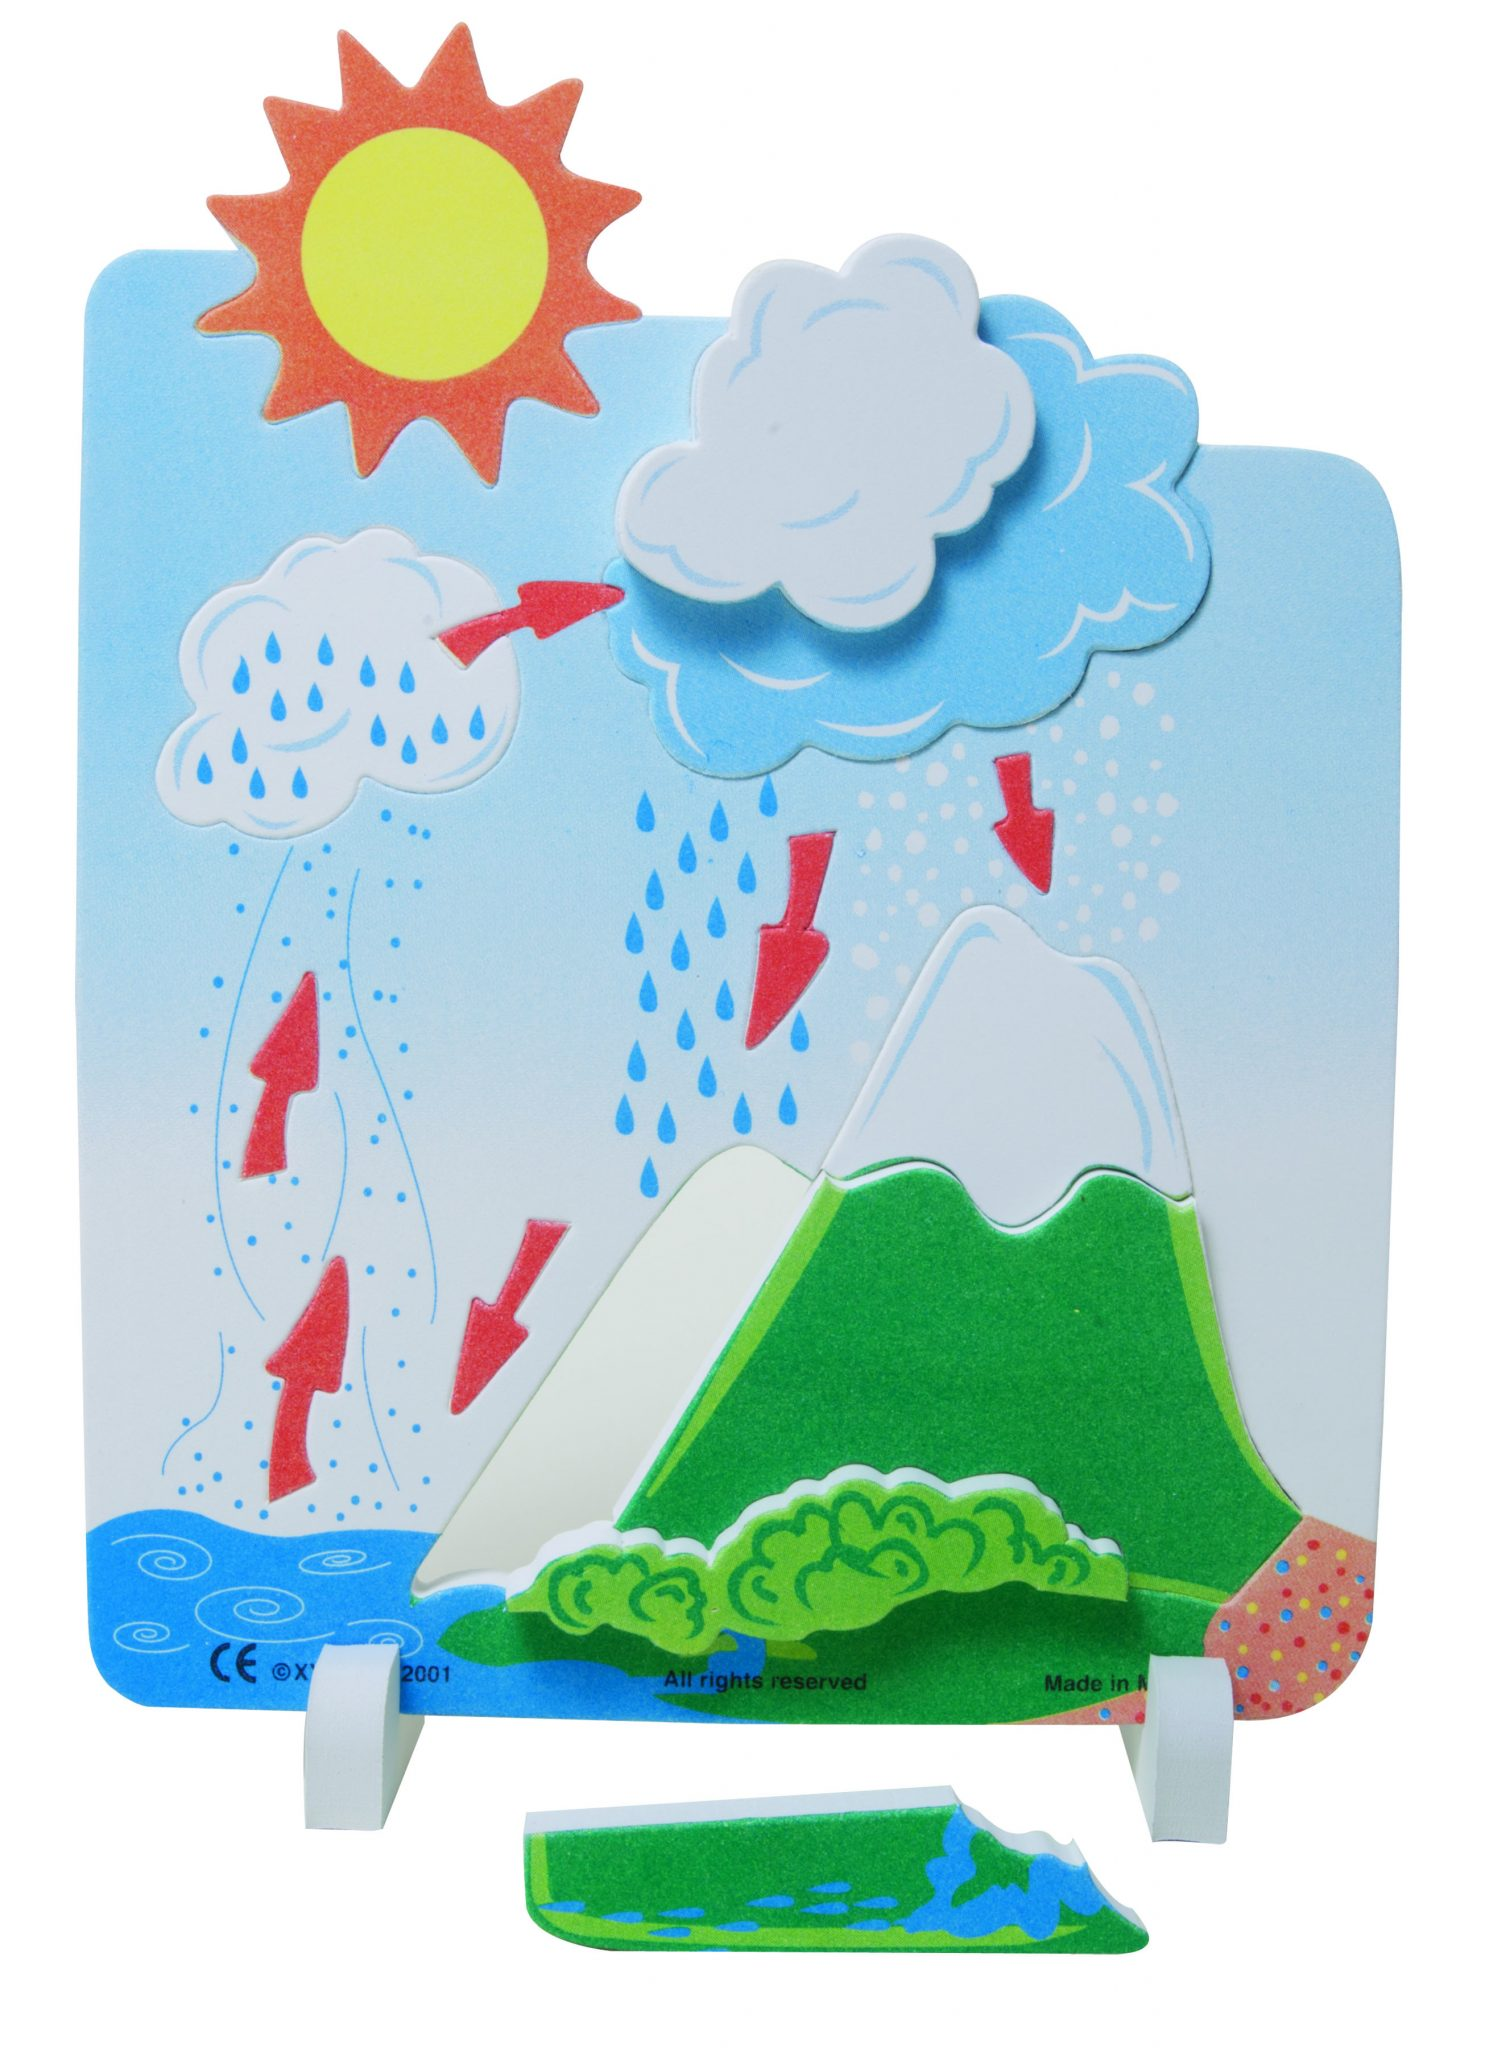 Book Plus Foam Model Water Cycle Ajax Scientific Ltd